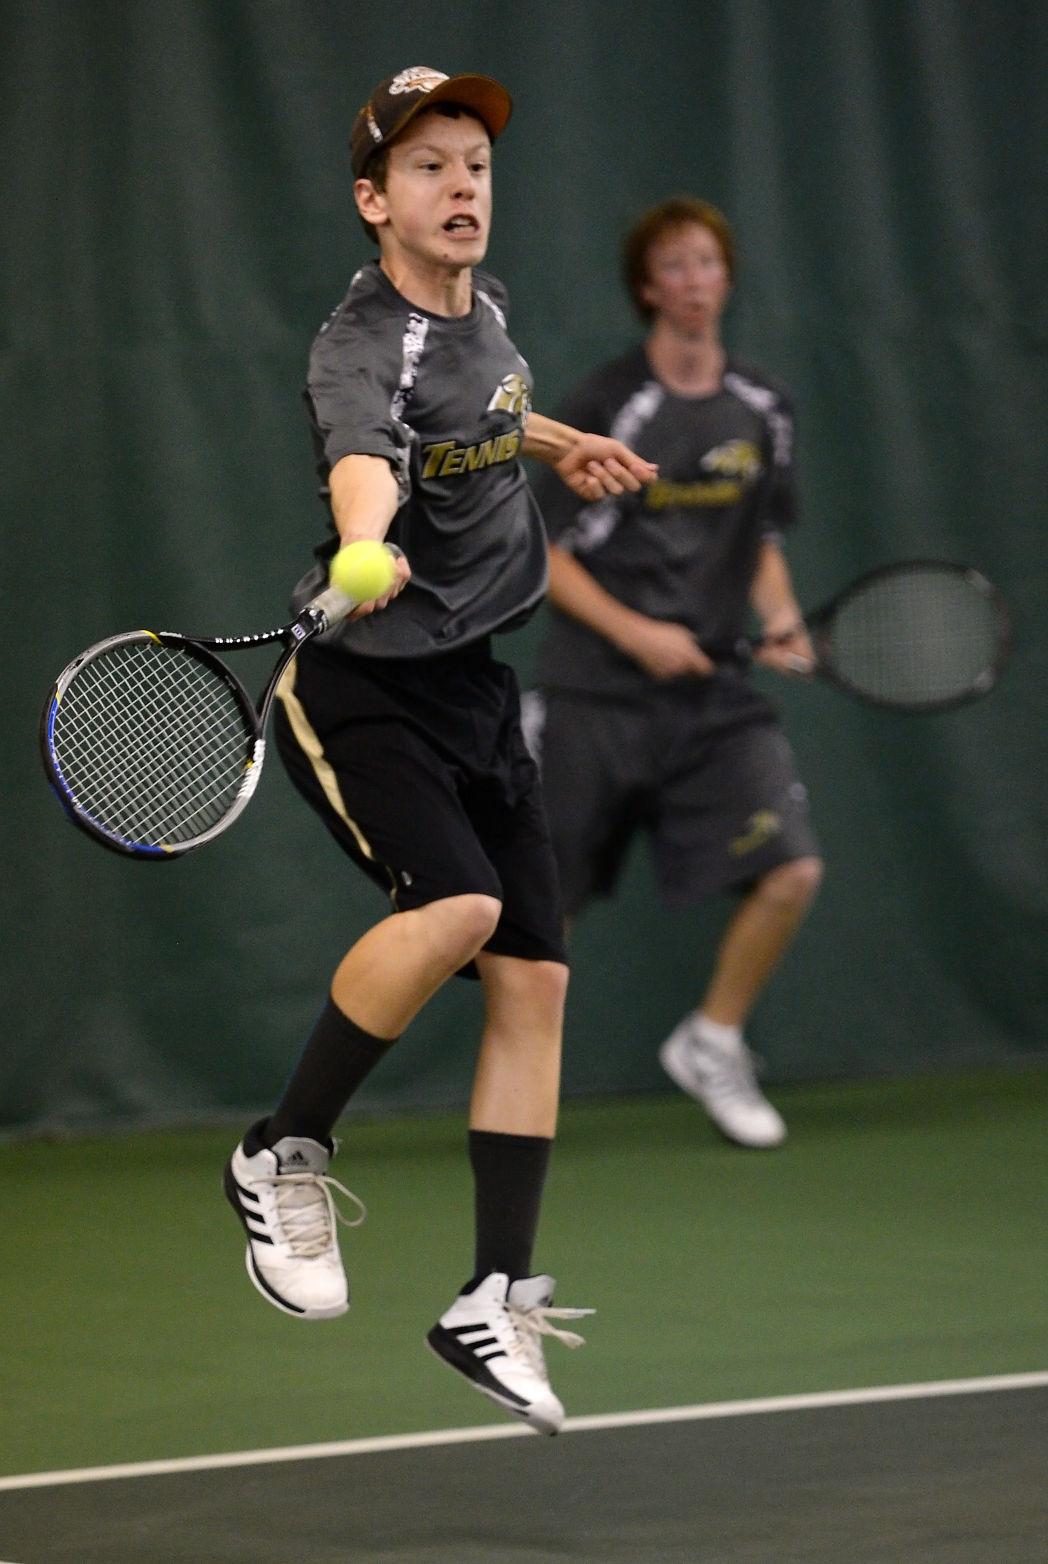 092515-spt-Tennis2